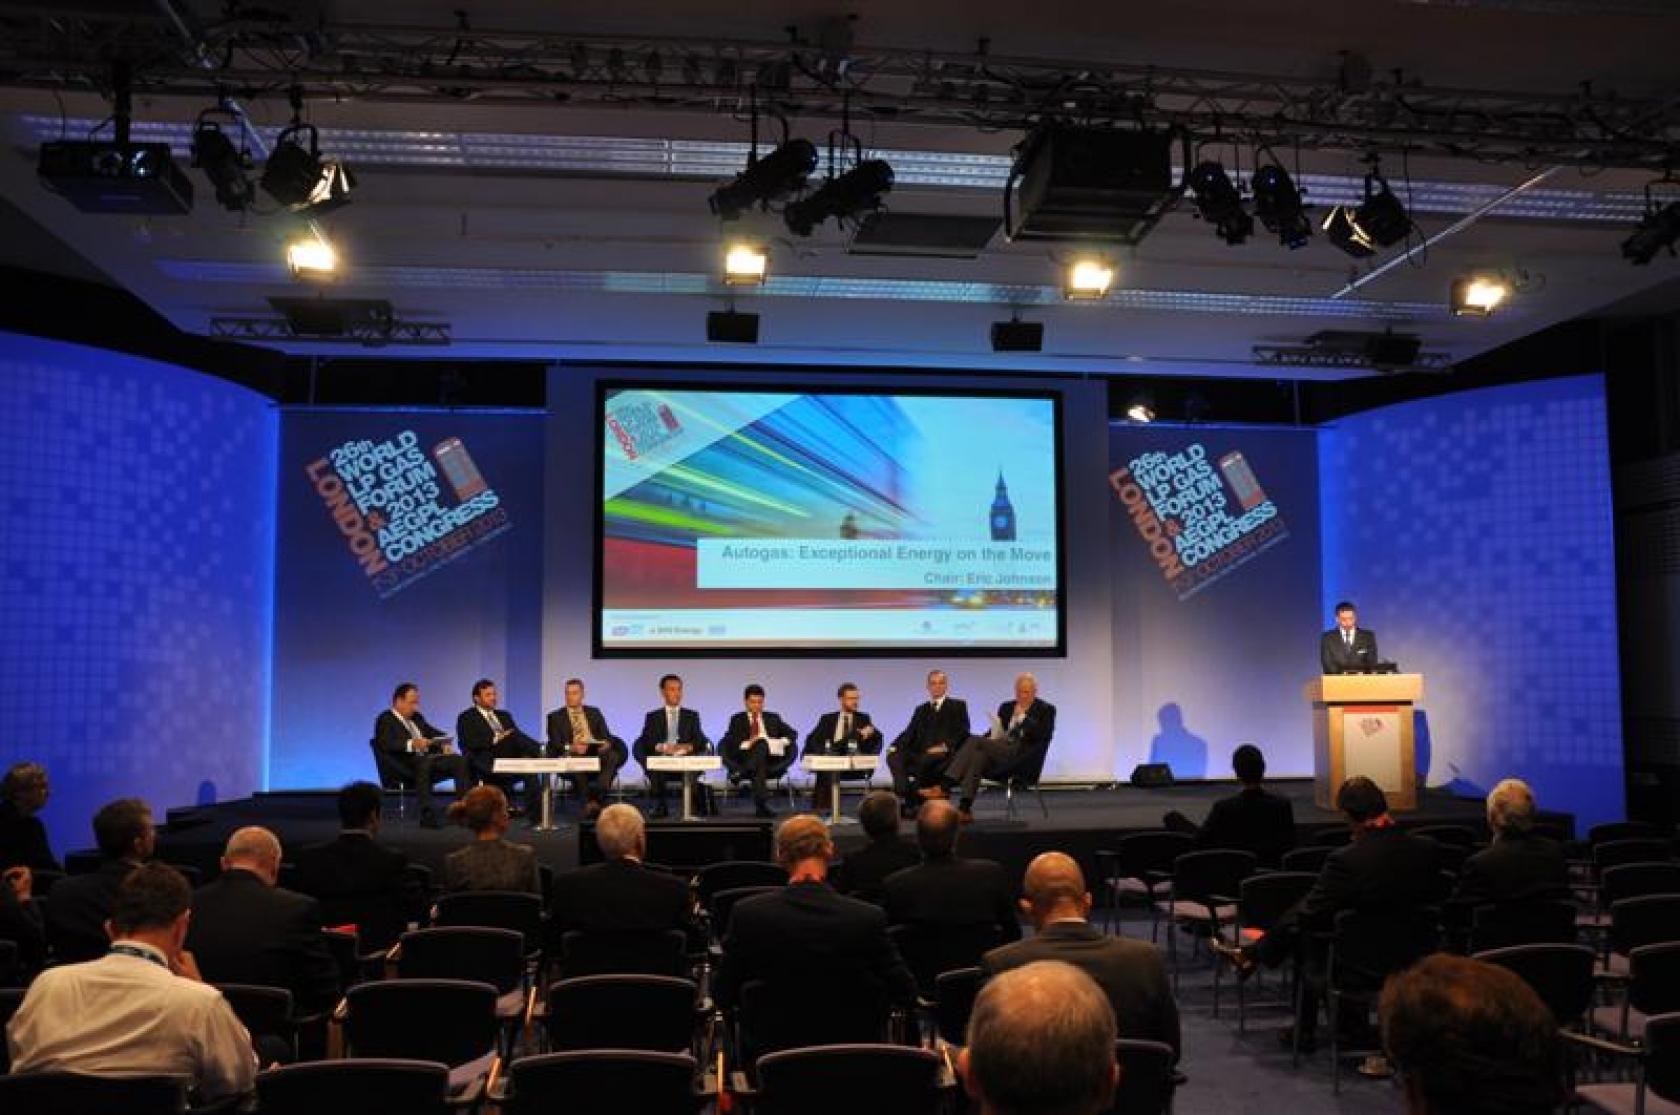 London - world's temporary LPG capital | gazeo com